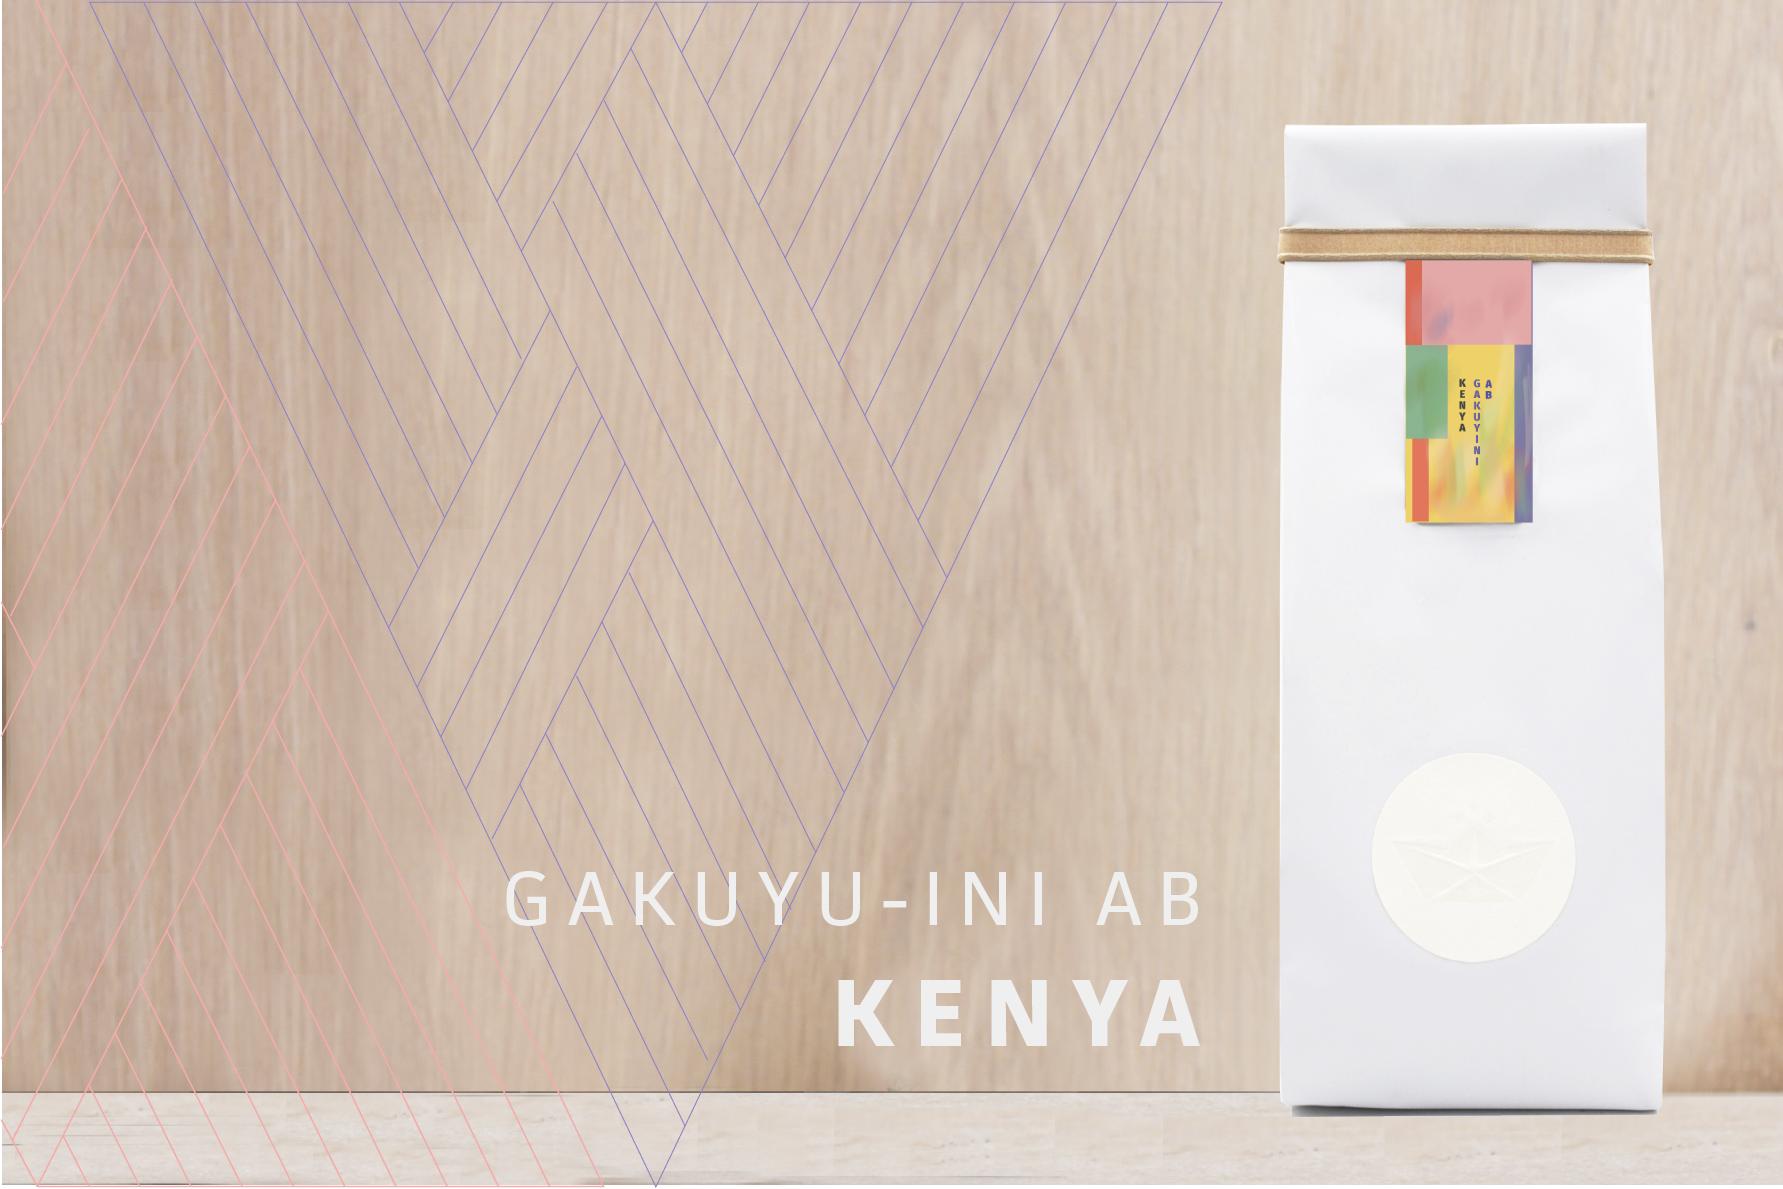 Kenya Gakuyu-Ini